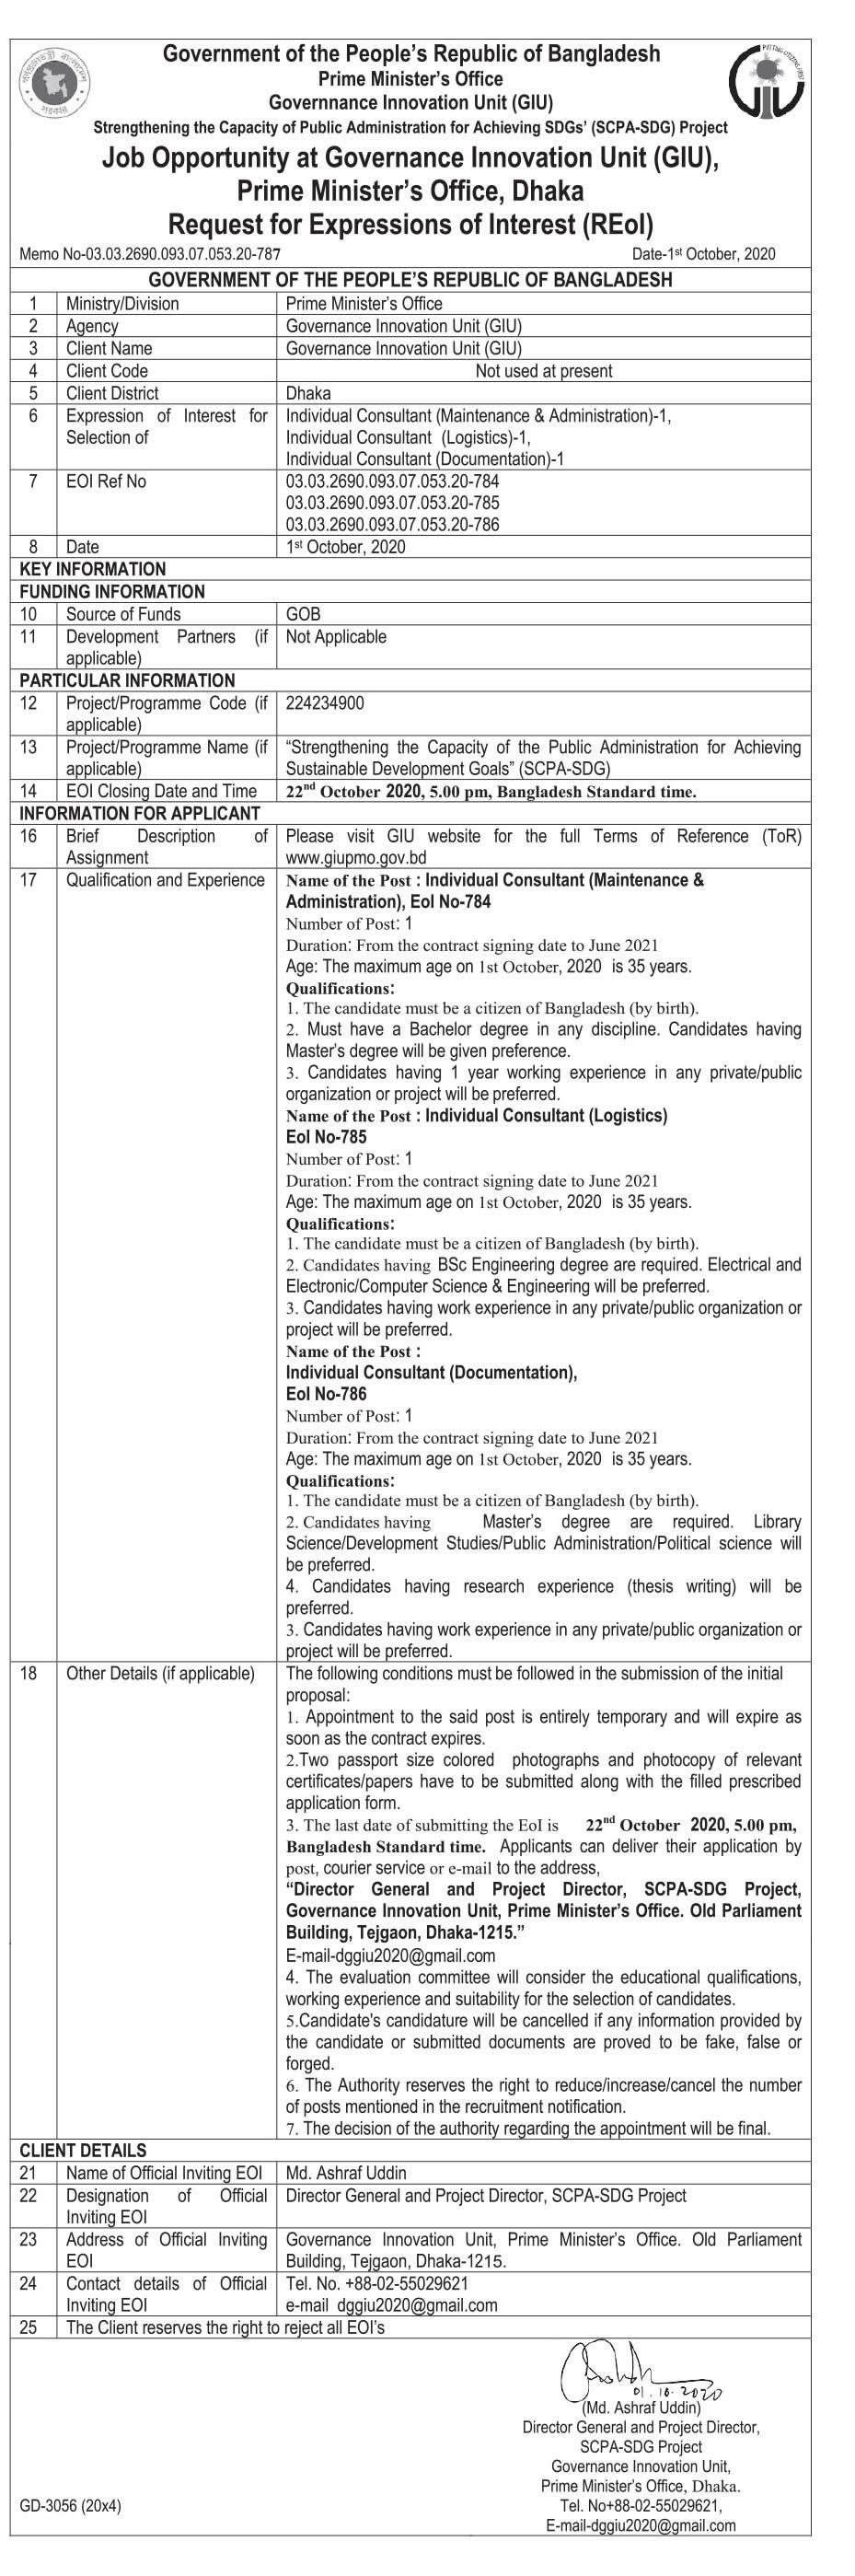 Governance Innovation Unit Job Circular